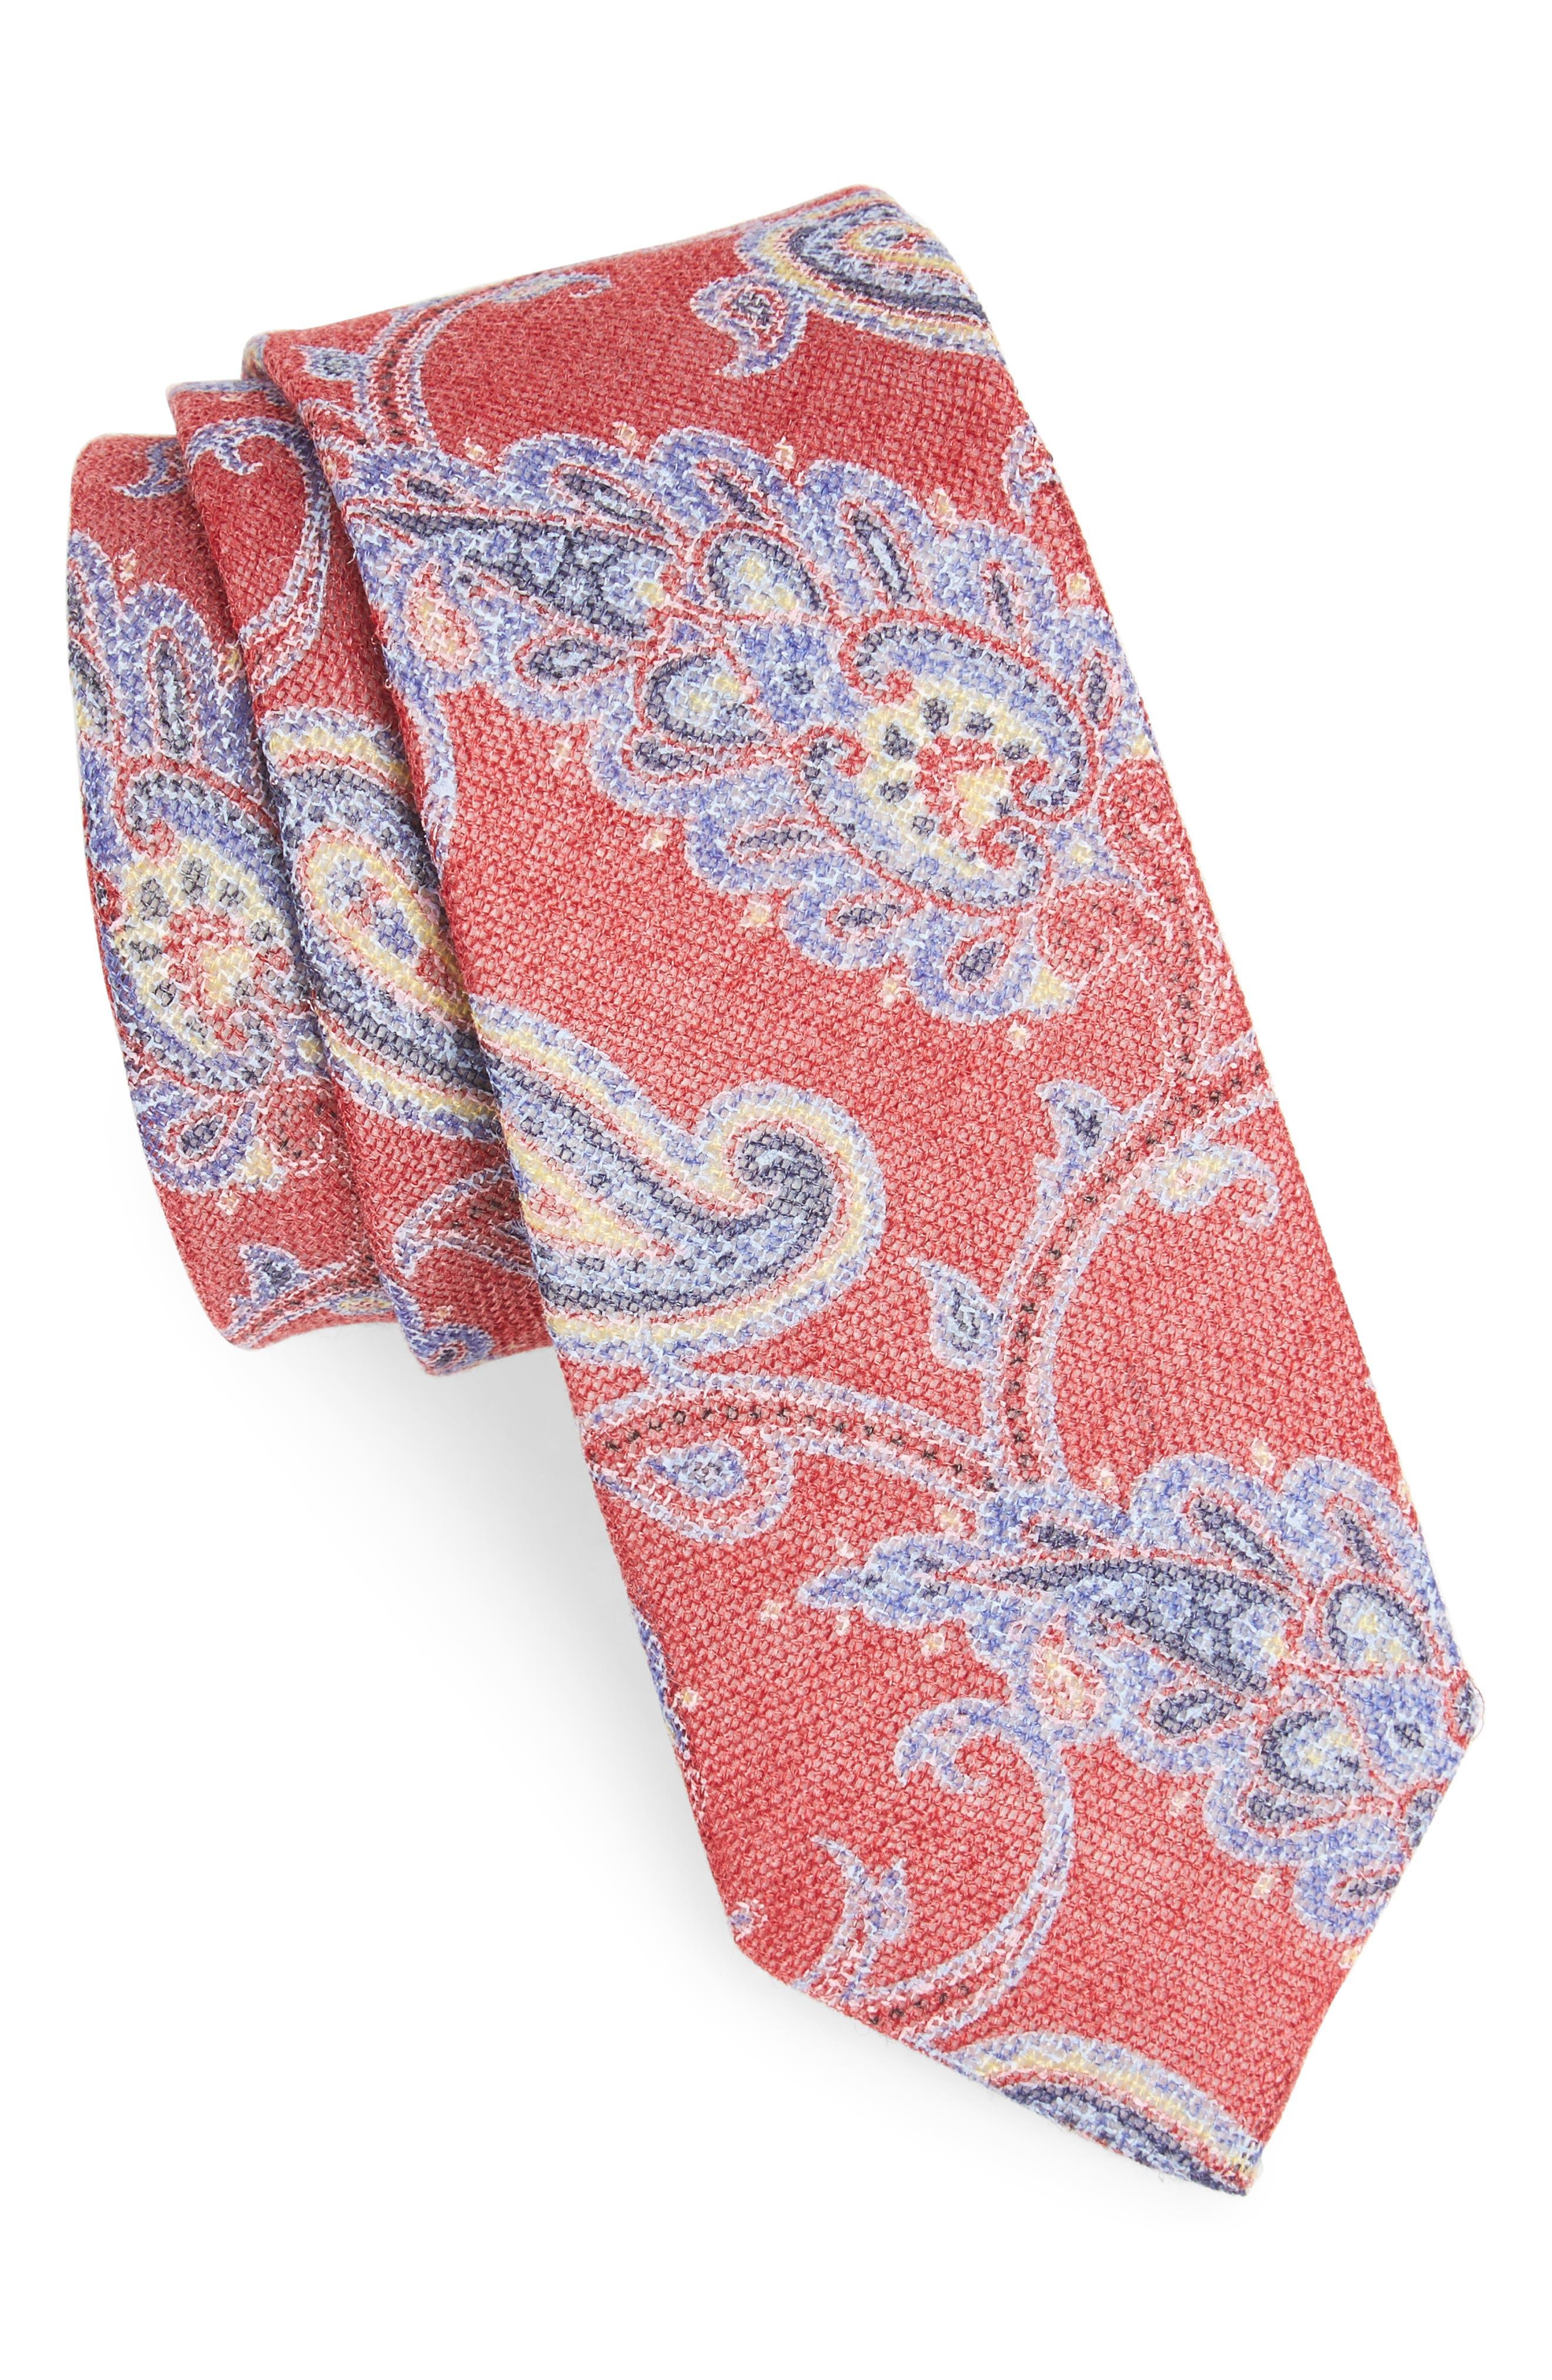 Bradford Paisley Skinny Tie,                             Main thumbnail 5, color,